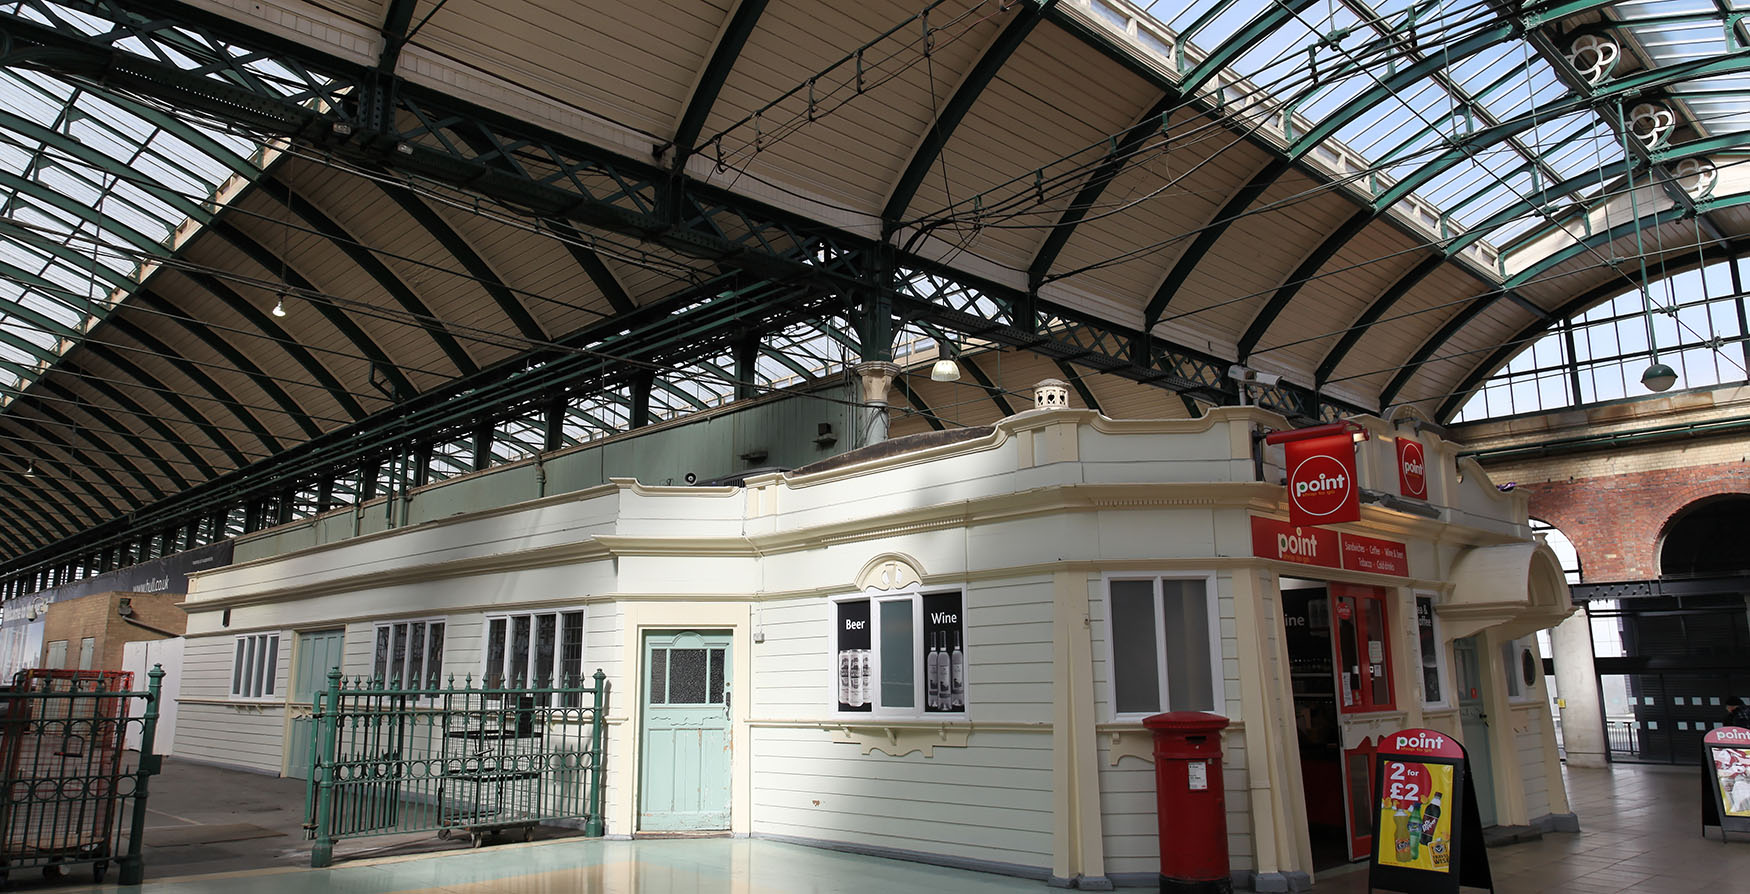 Railway station restored